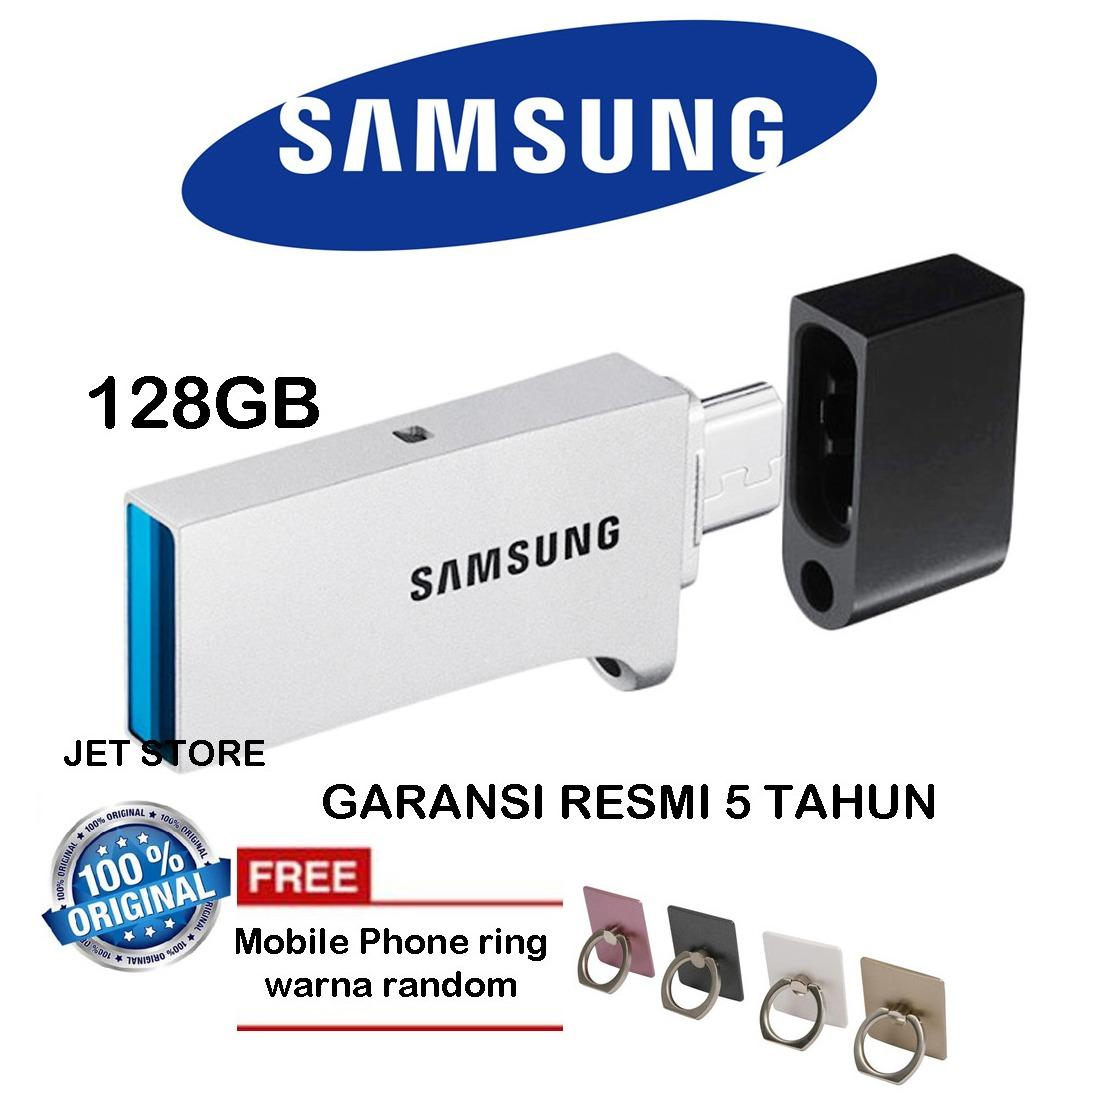 Review Samsung Flashdisk Otg Usb 3 128Gb Duo Drive Iring Mobile Phone Samsung Di Dki Jakarta